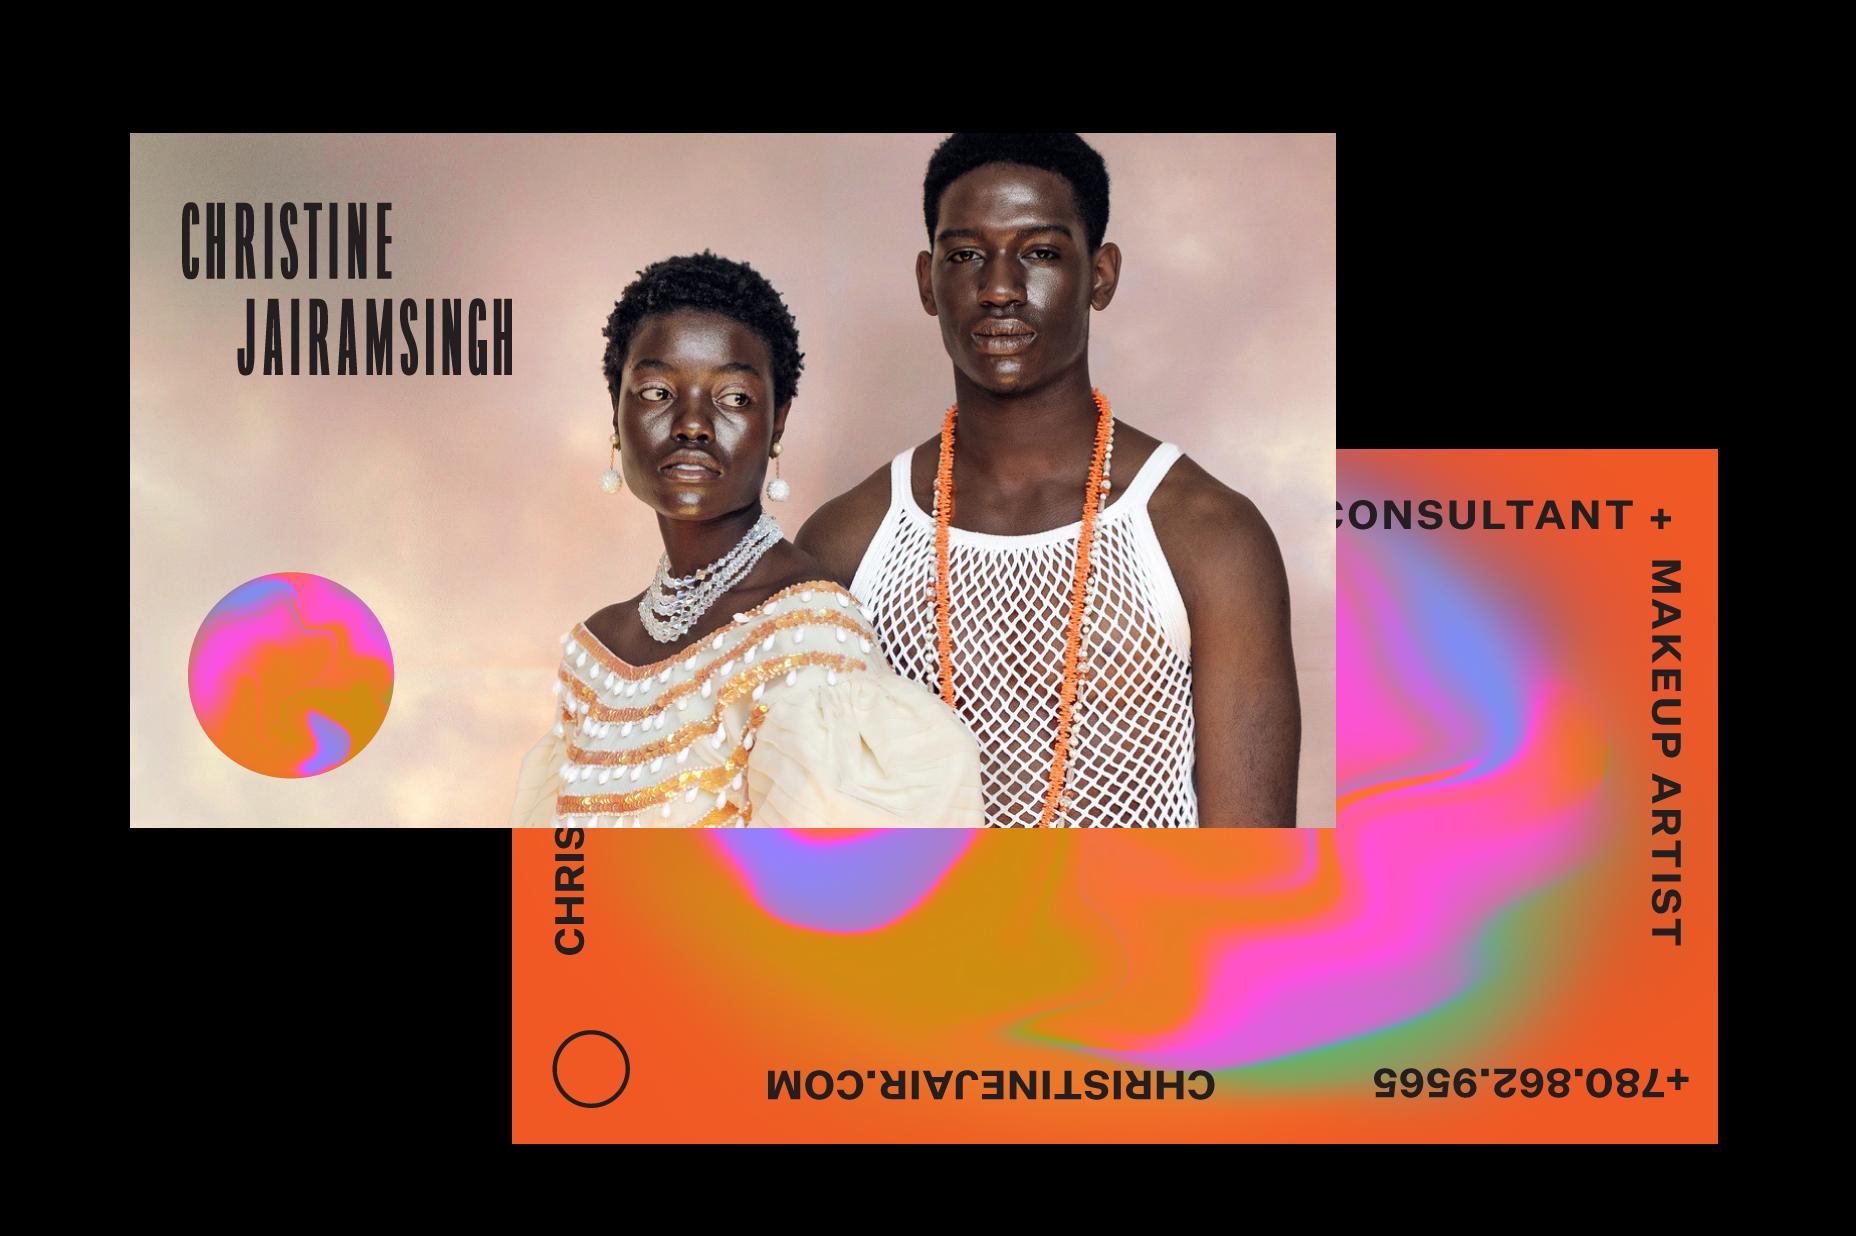 Brand identity for Christine Jairamsingh